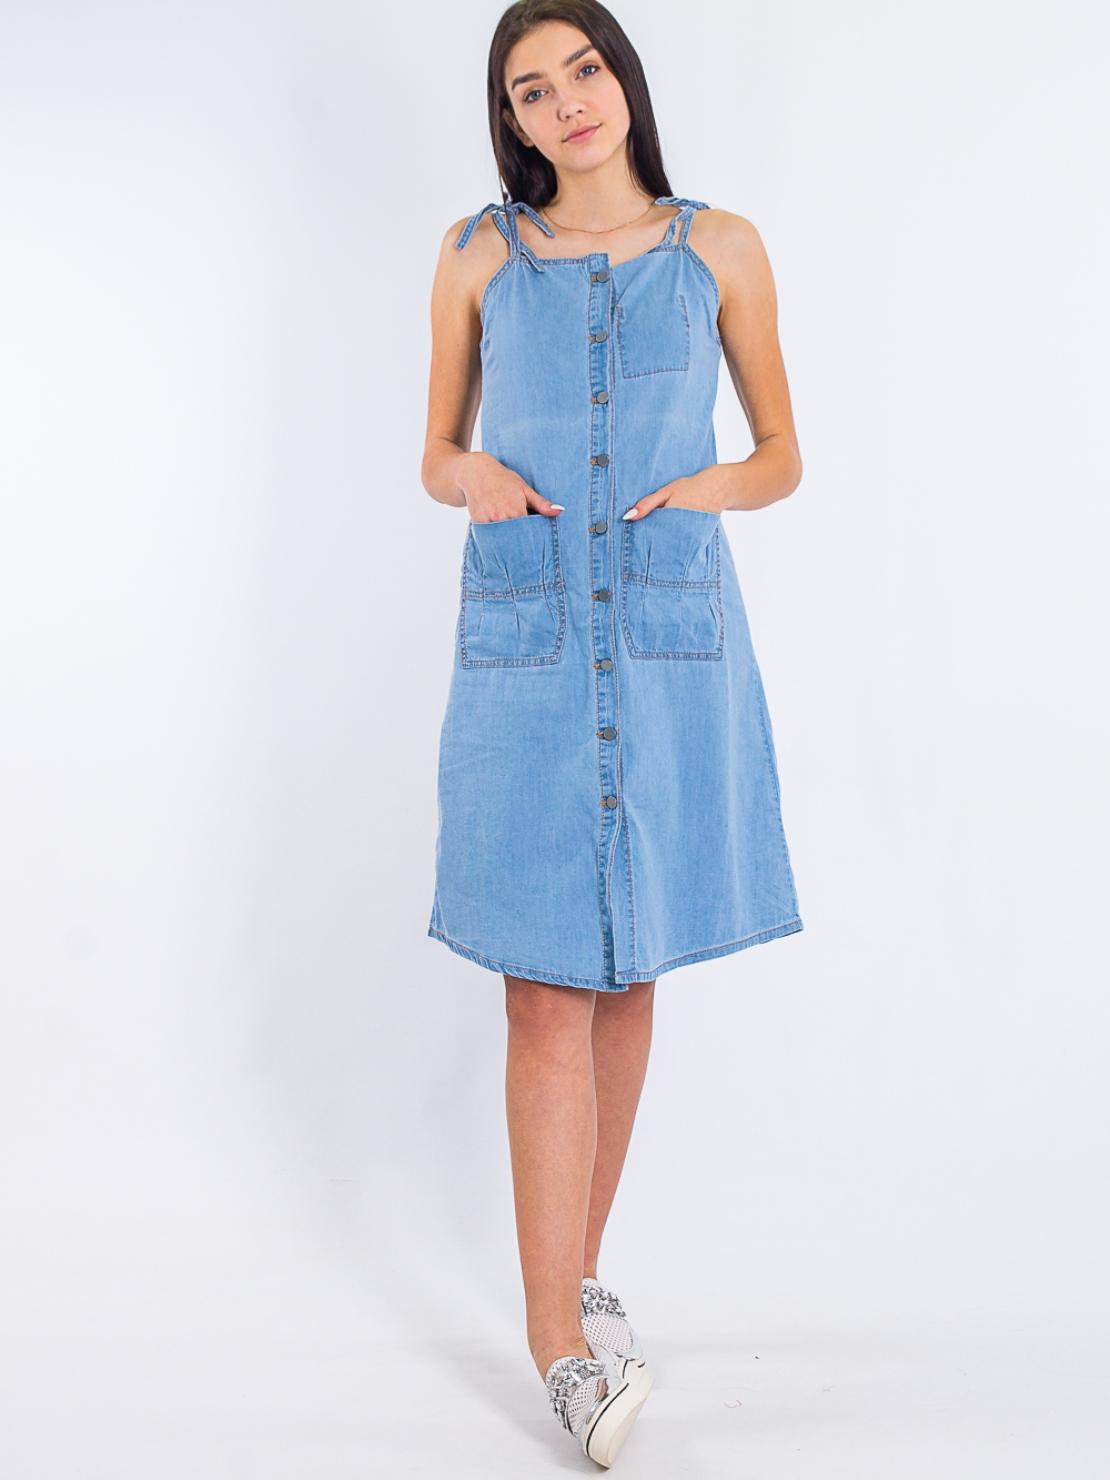 Джинсовое платье Lost Ink 1201115021520024 Синий Free Style